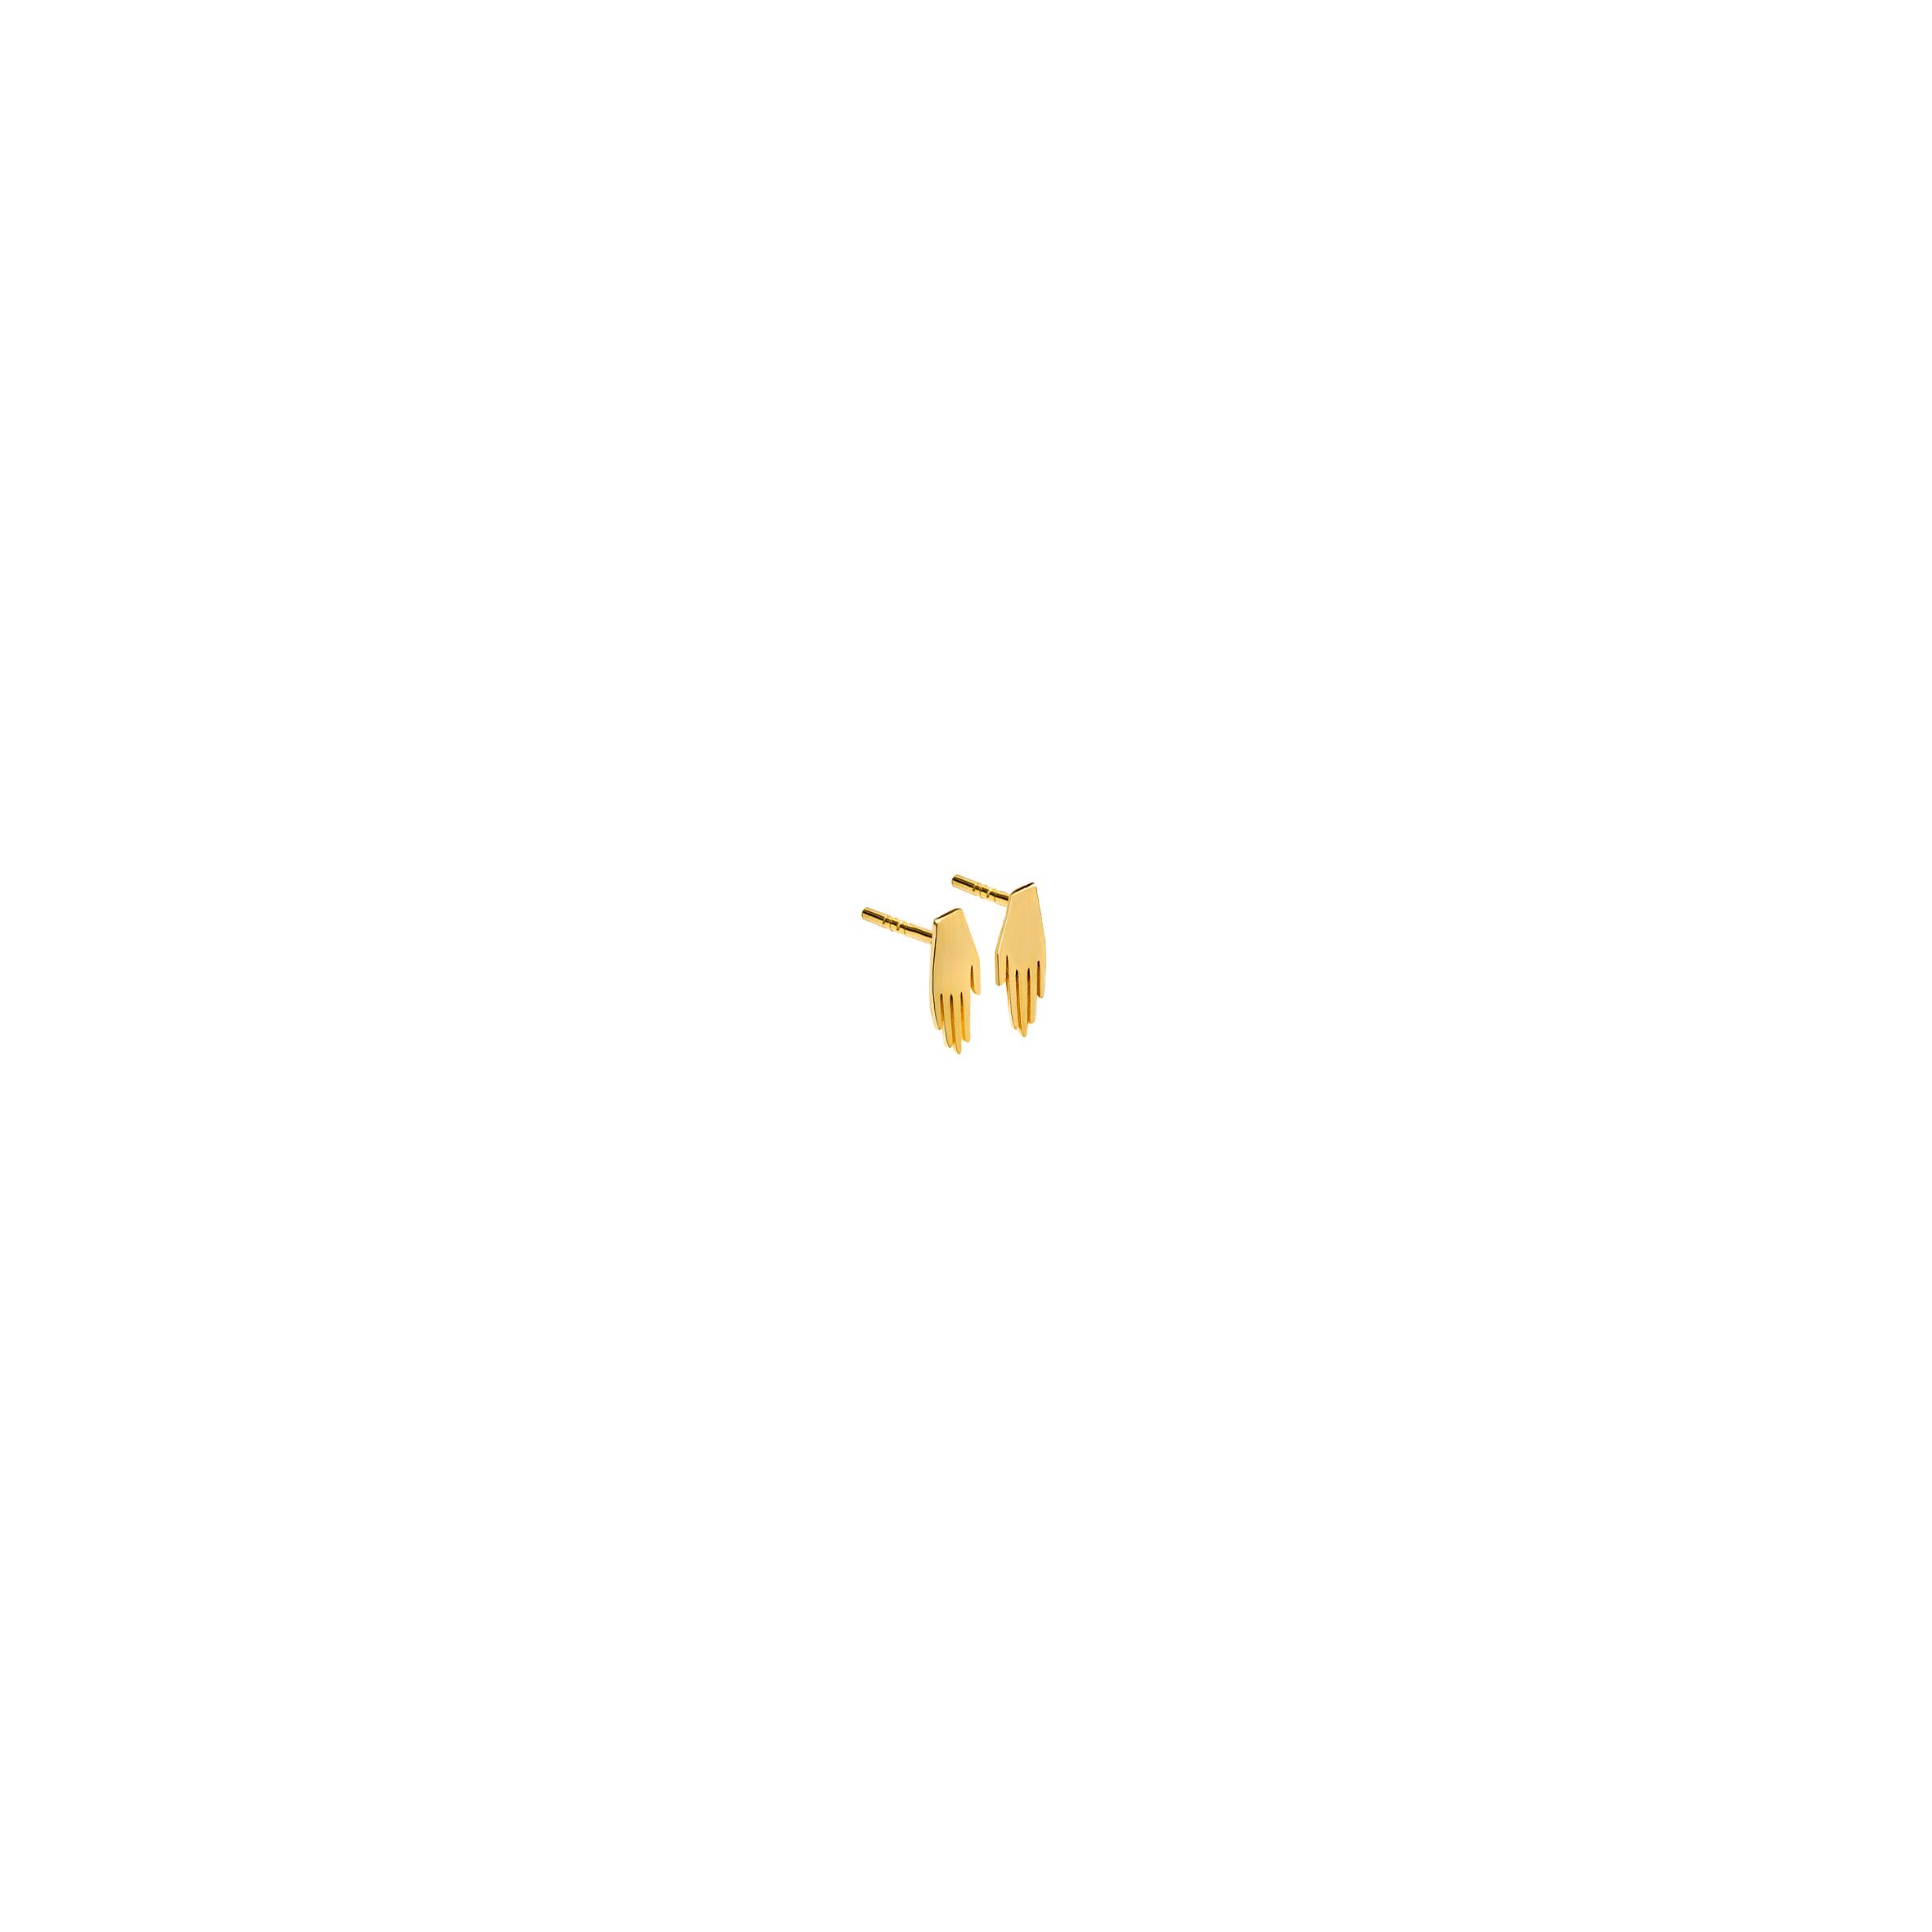 mini KOPI earrings – hand